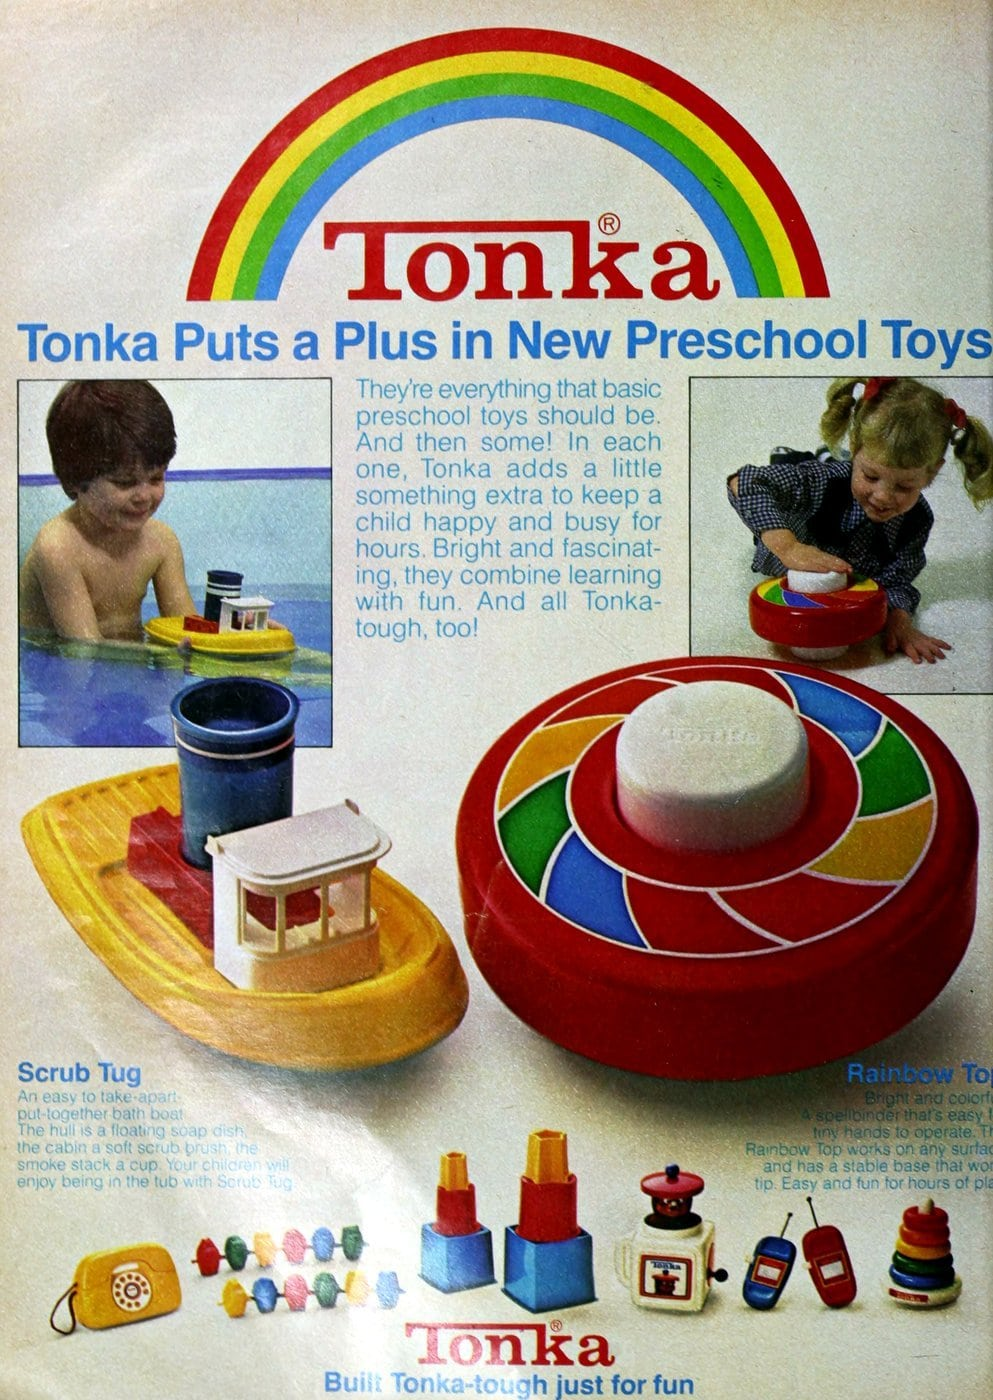 Tonka Scrub Tug and Rainbow Top preschool toys (1980)